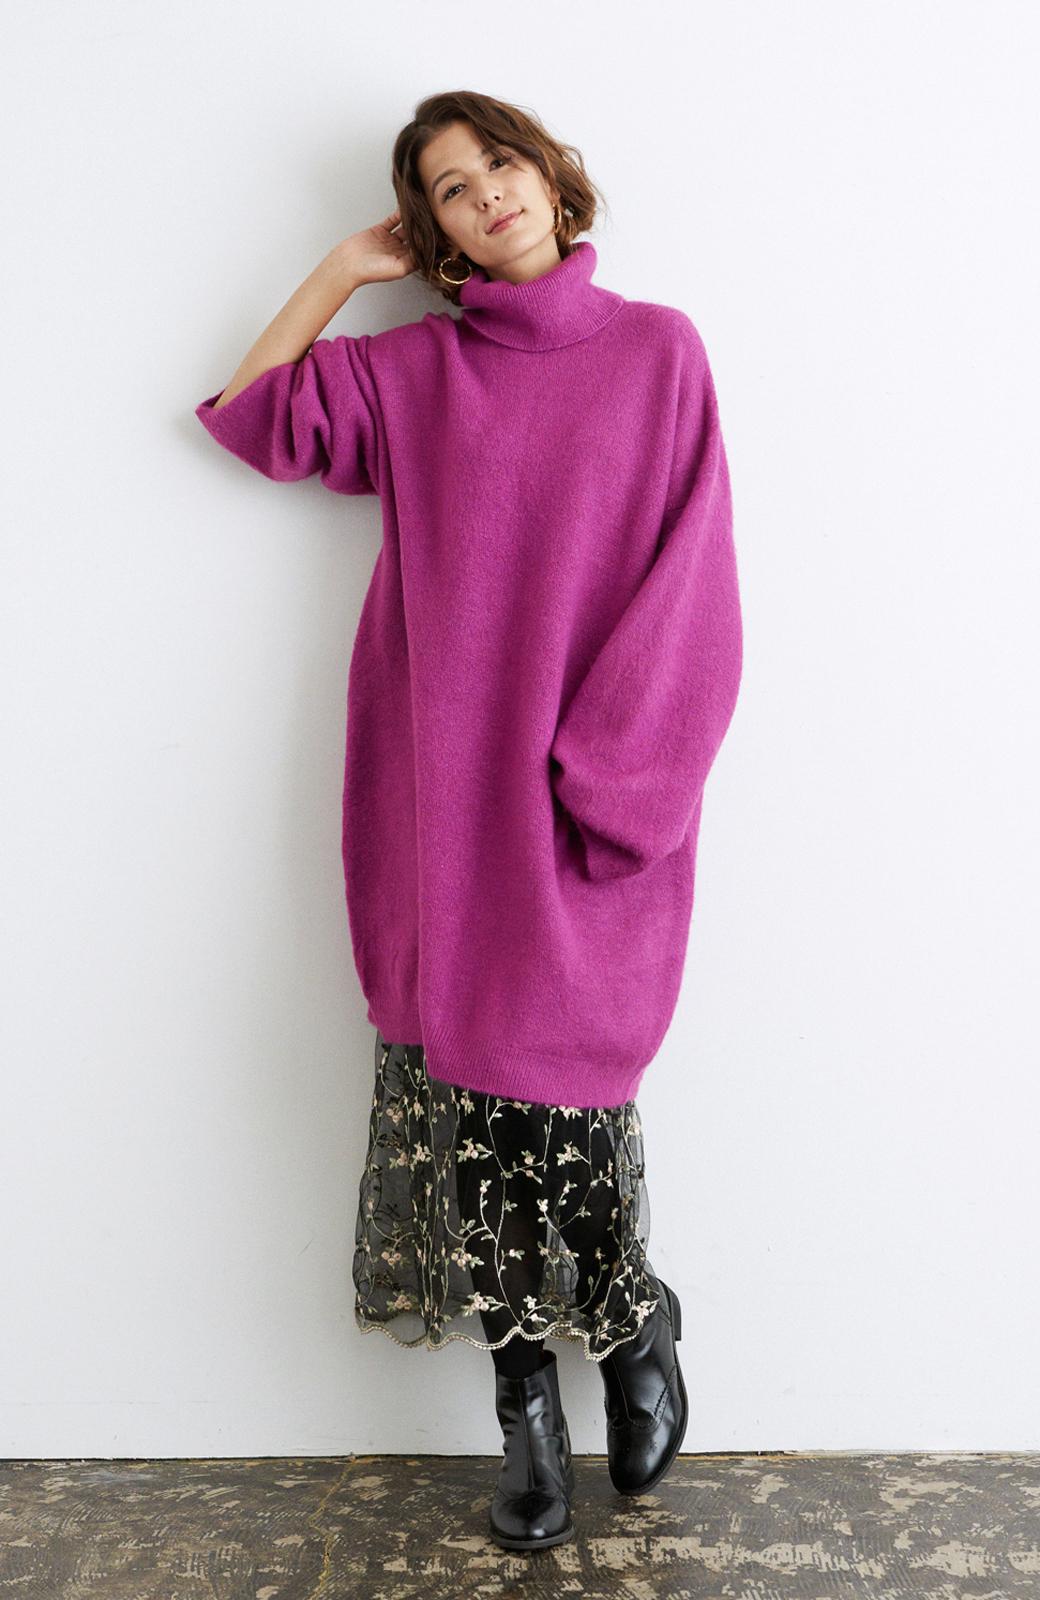 haco! <スザンヌさんコラボ>ラブ&ピースプロジェクト ニットワンピ&チュール刺しゅうスカートセット <パープル系その他>の商品写真1